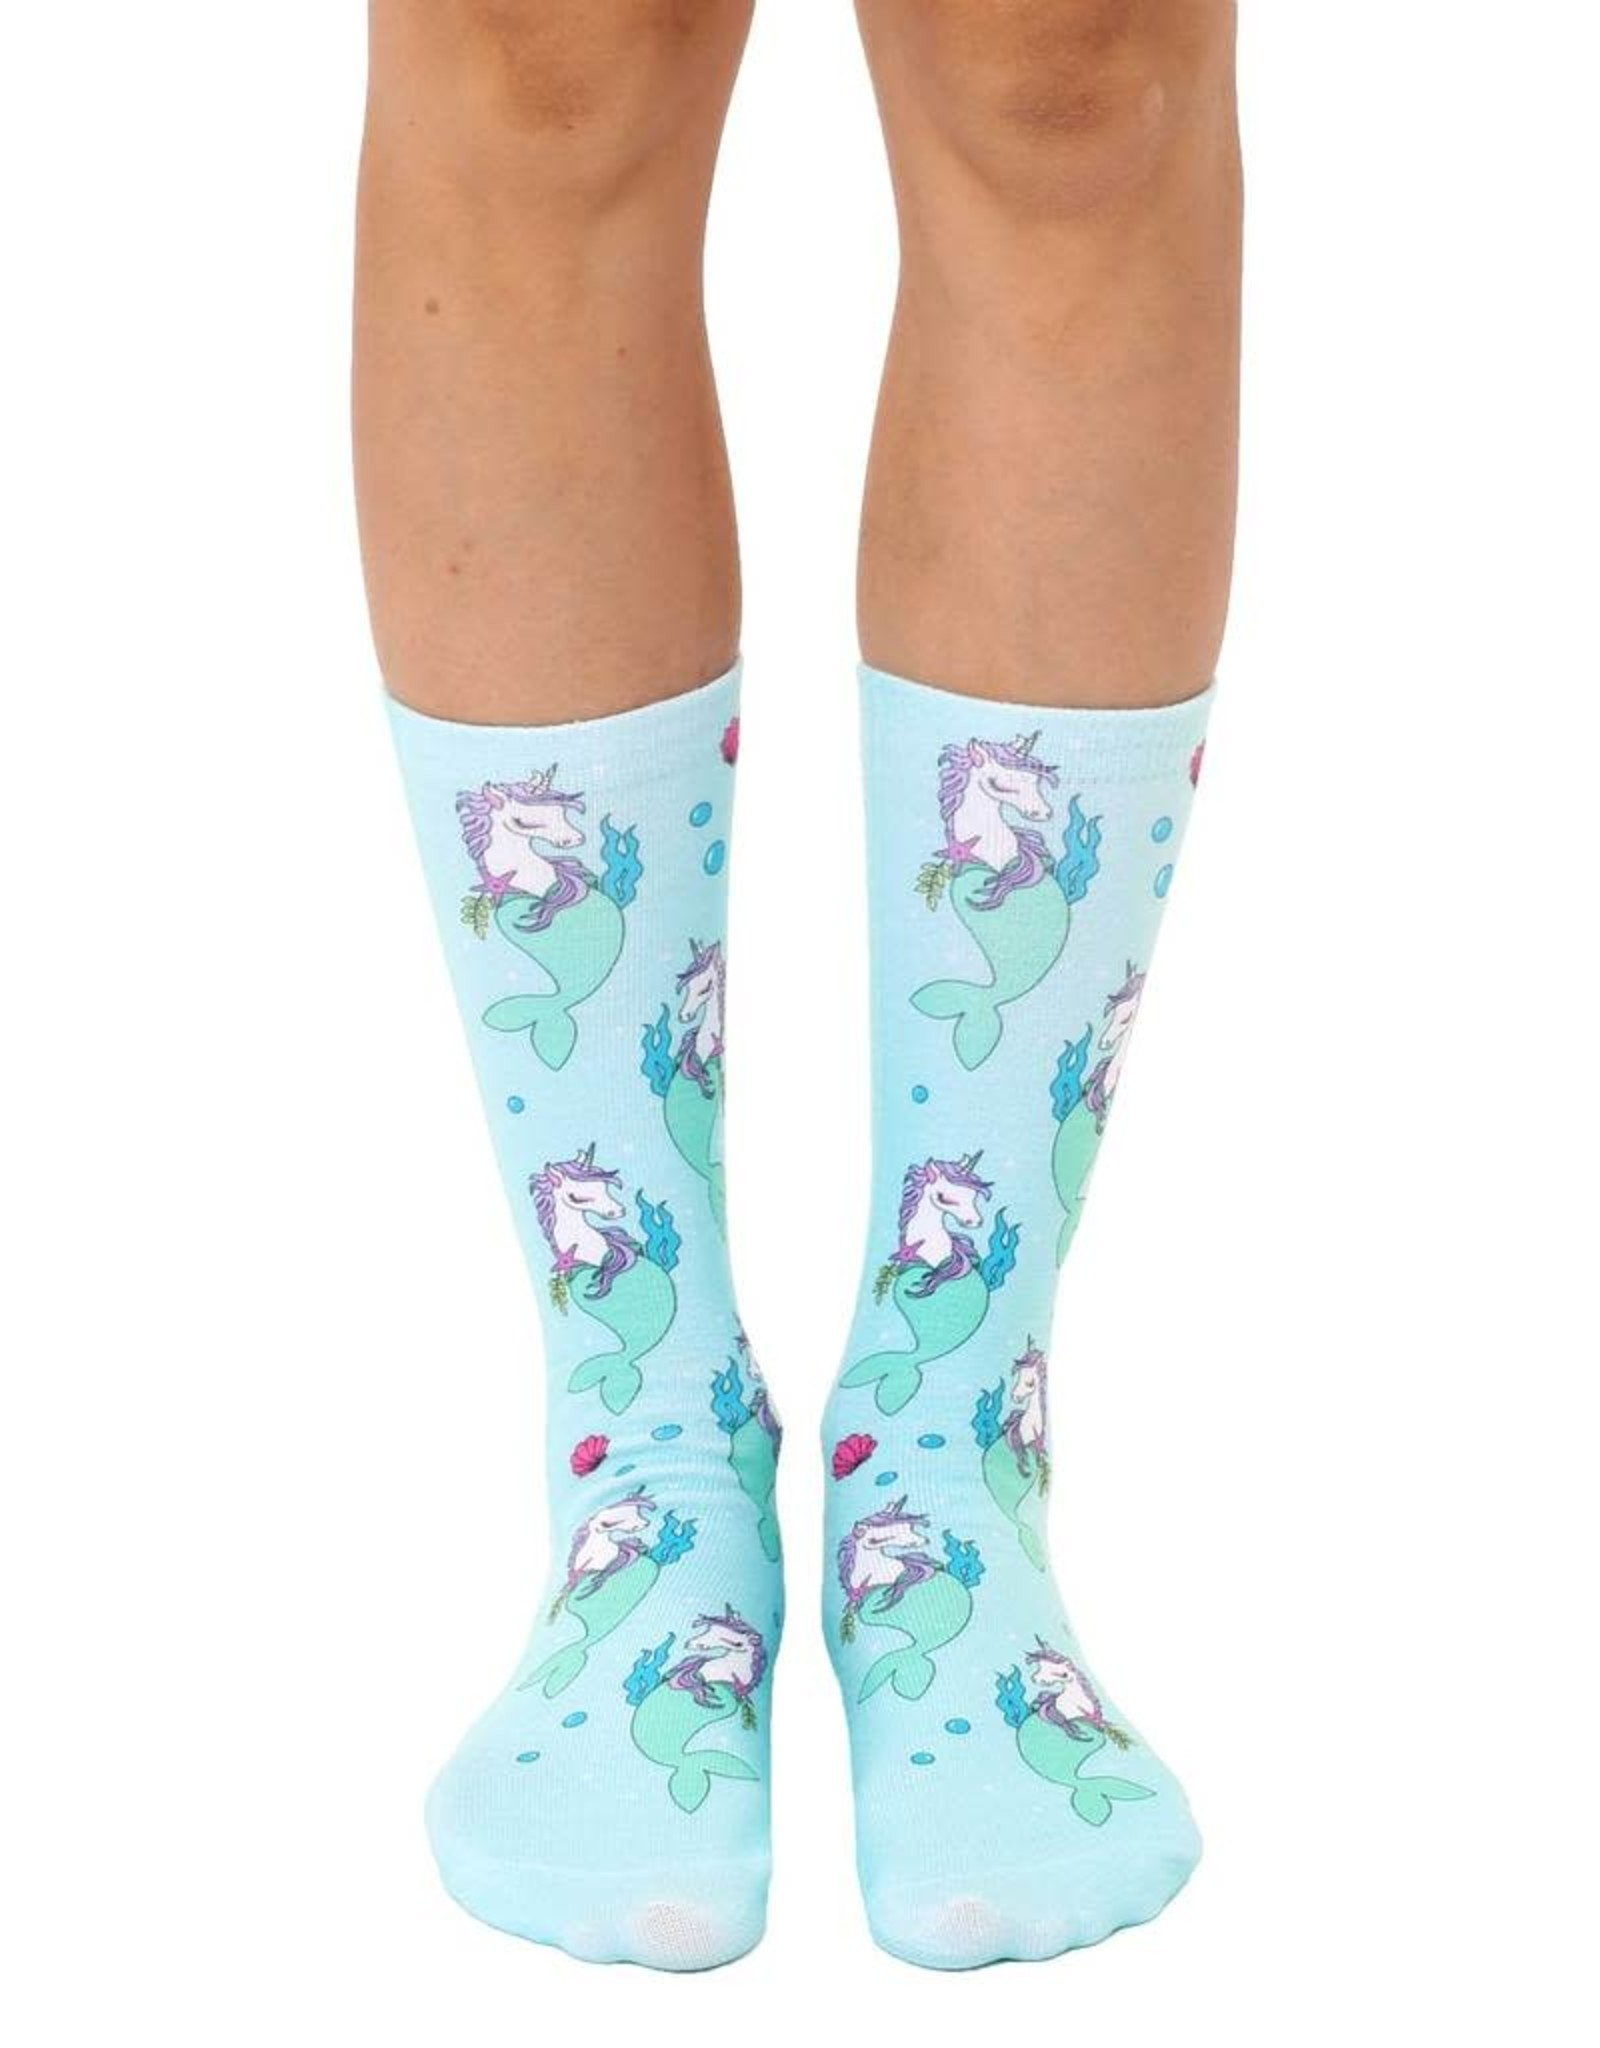 La Licornerie Unicorn/Mermaid Calf High Socks